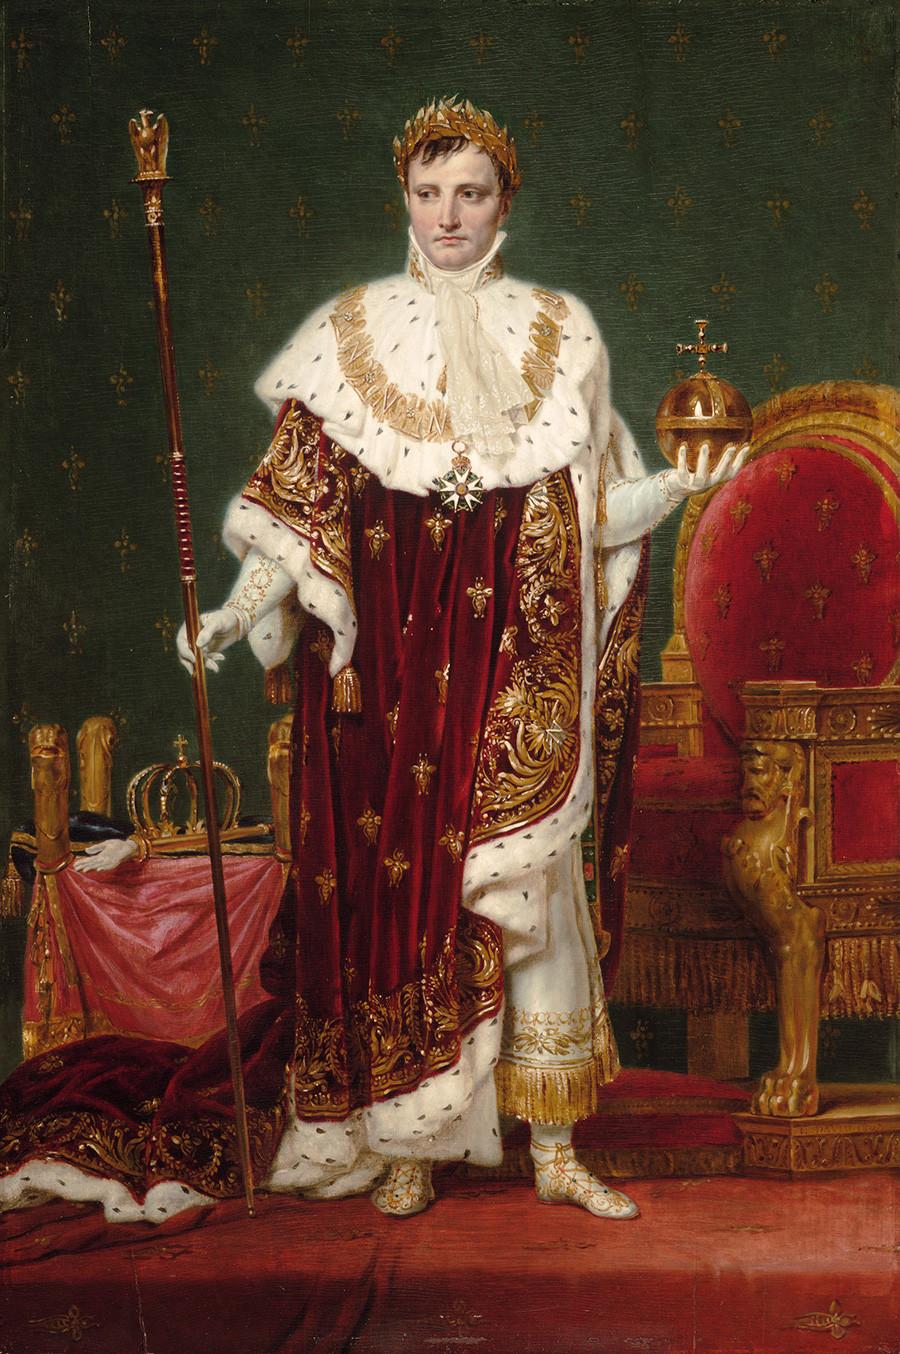 Emperor Napoleon I (1769-1821) by Jacques-Louis David, 1807